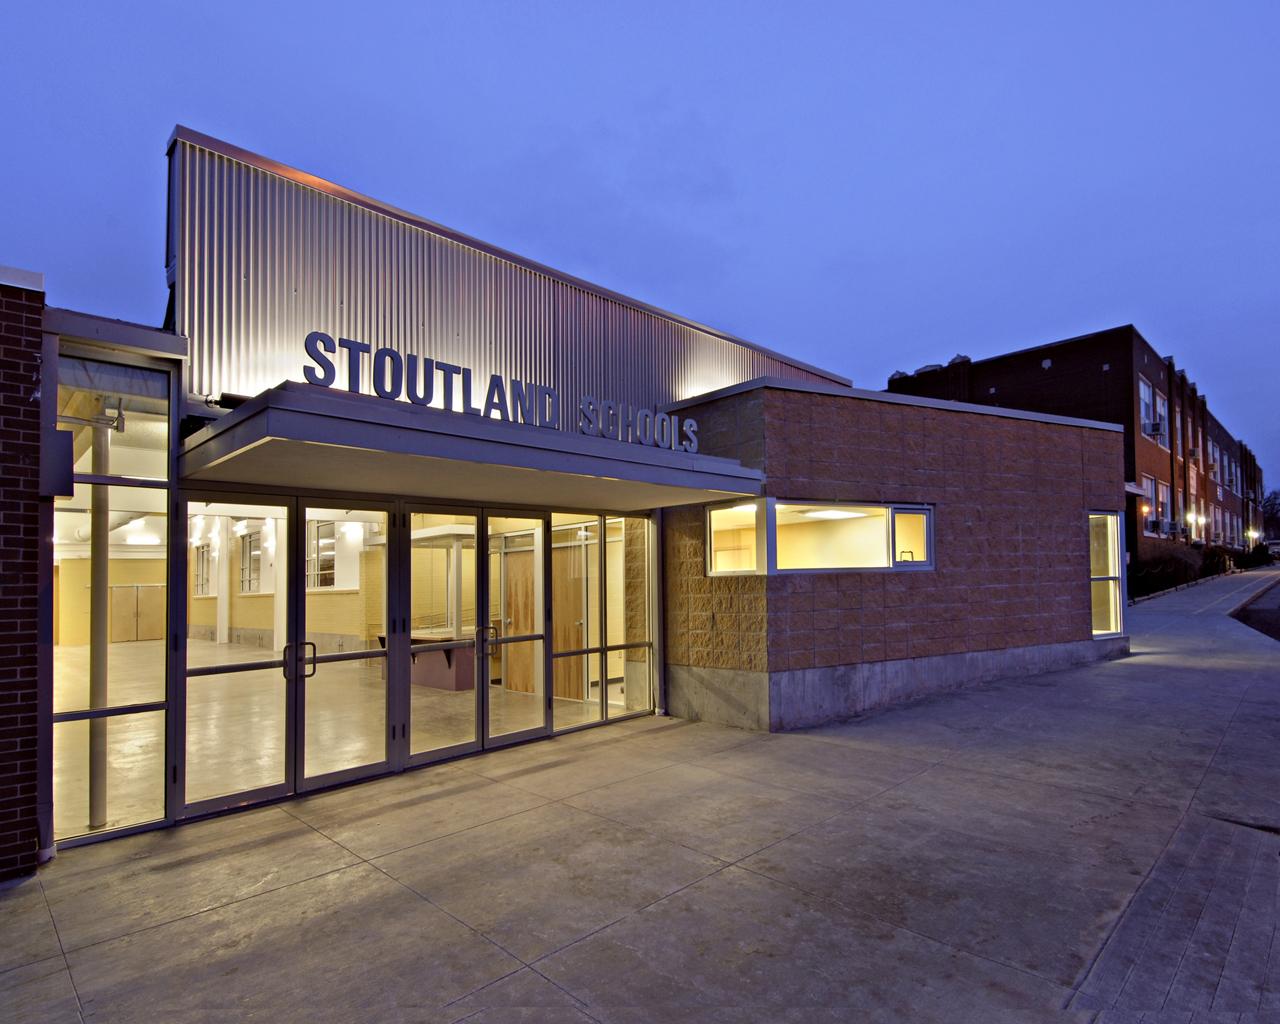 Stoutland School / Dake   Wells Architecture, © Architectural Imageworks